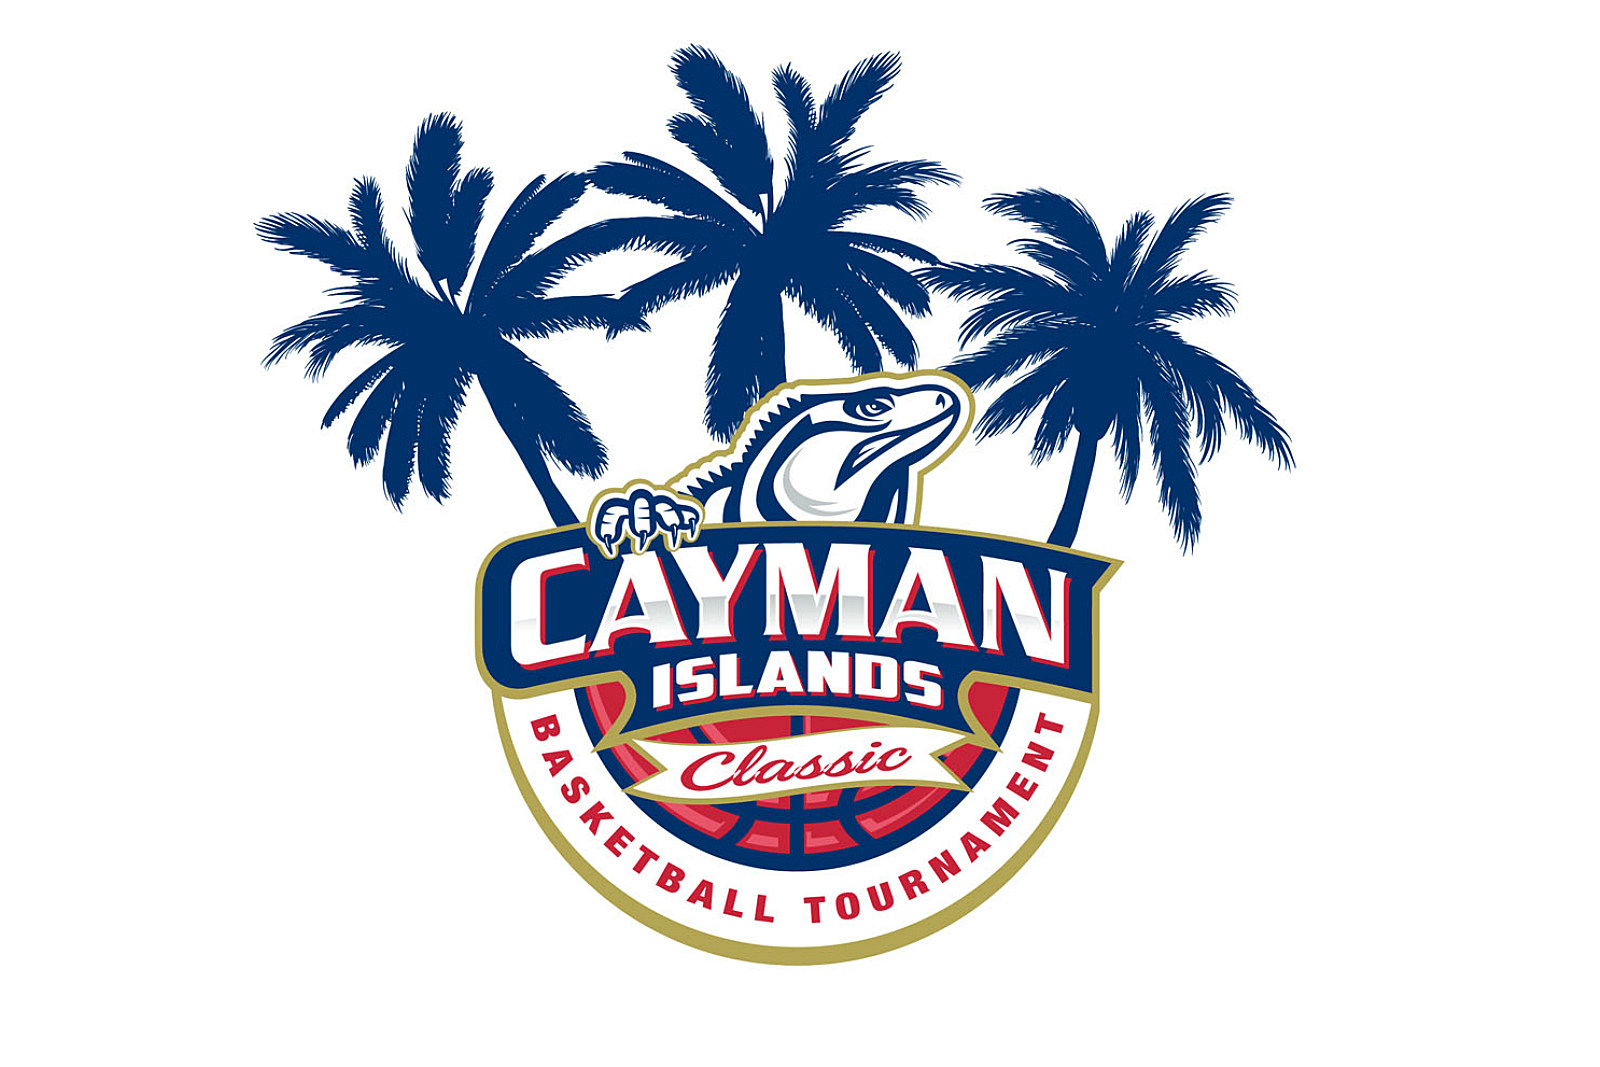 Cayman Islands Classic logo 2017